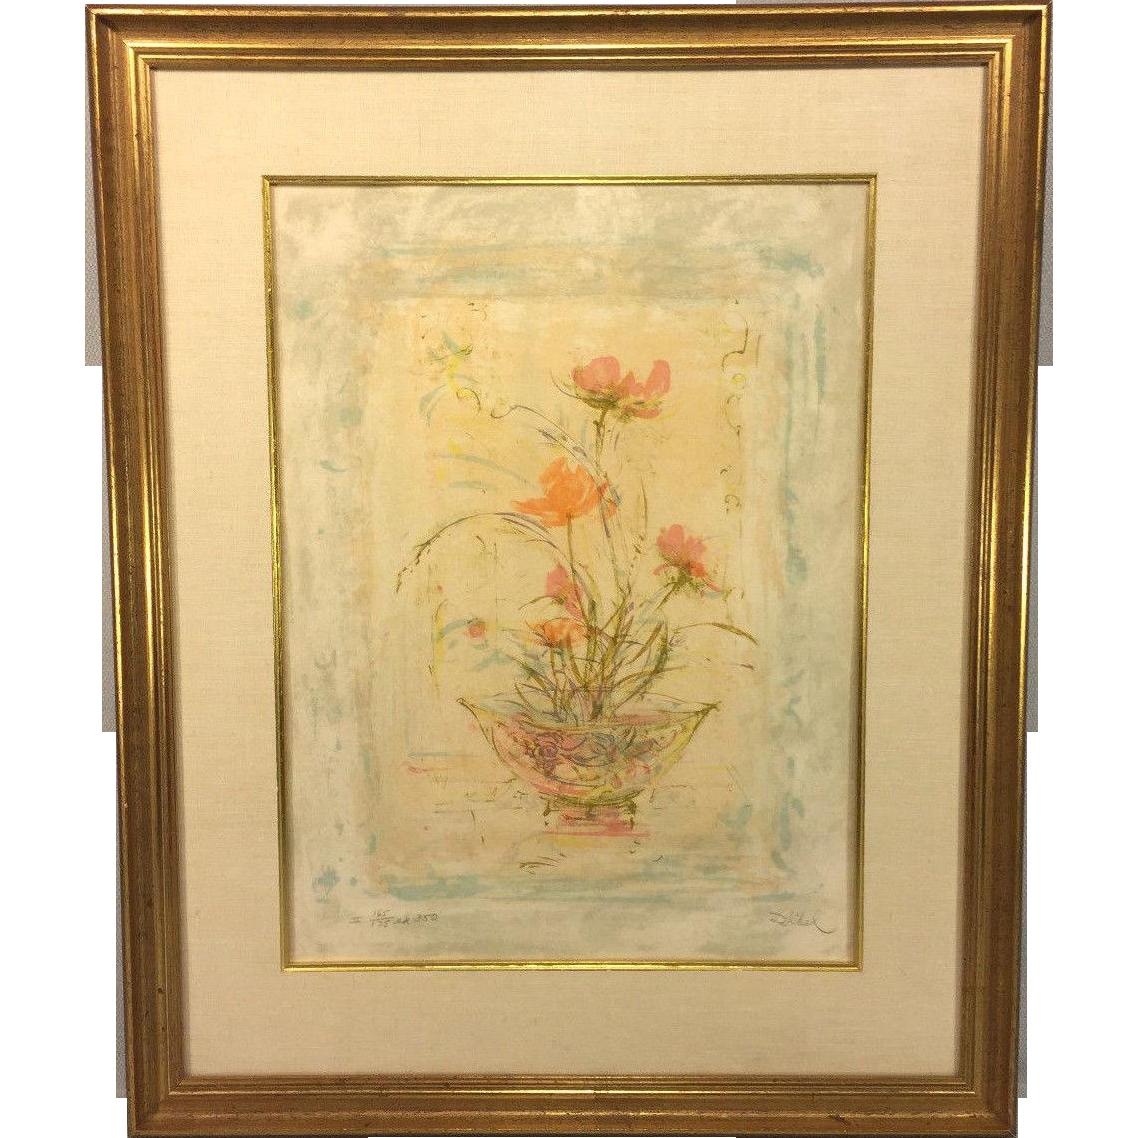 Edna Hibel Limited Edition Floral Print 165 175 Matted